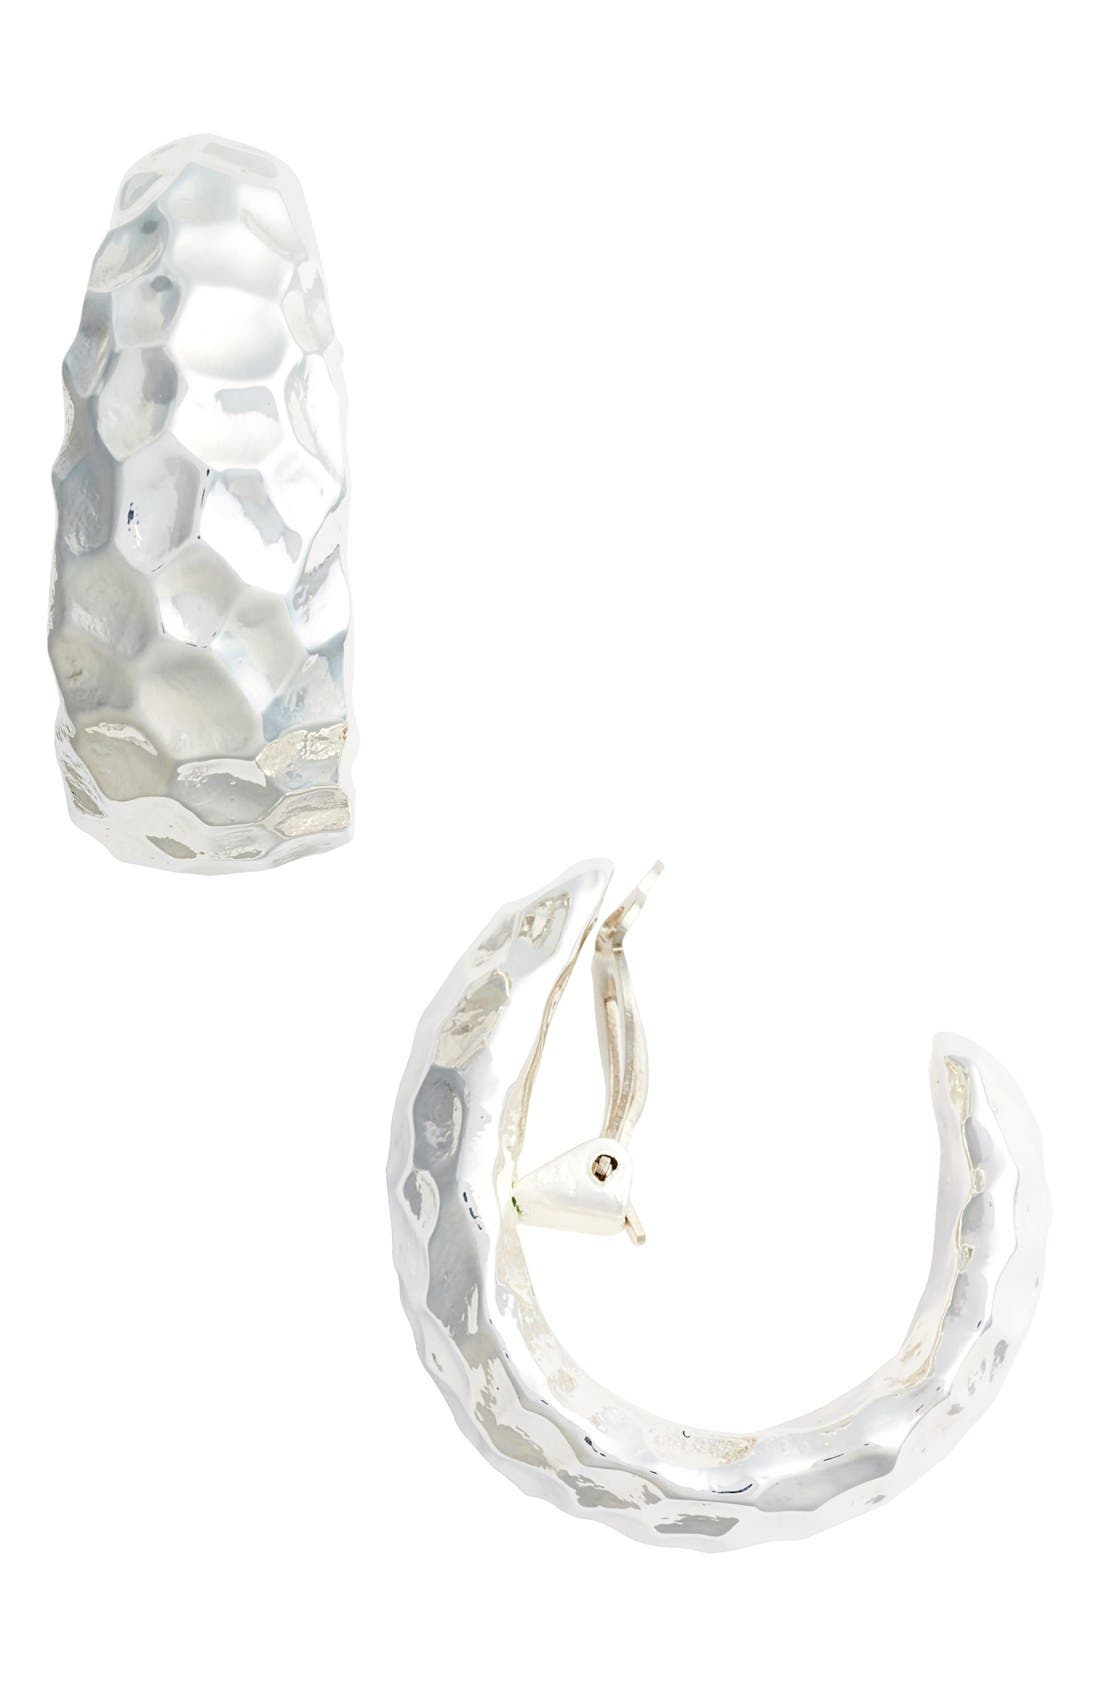 Simon Sebbag Hammered Clip Hoop Earrings